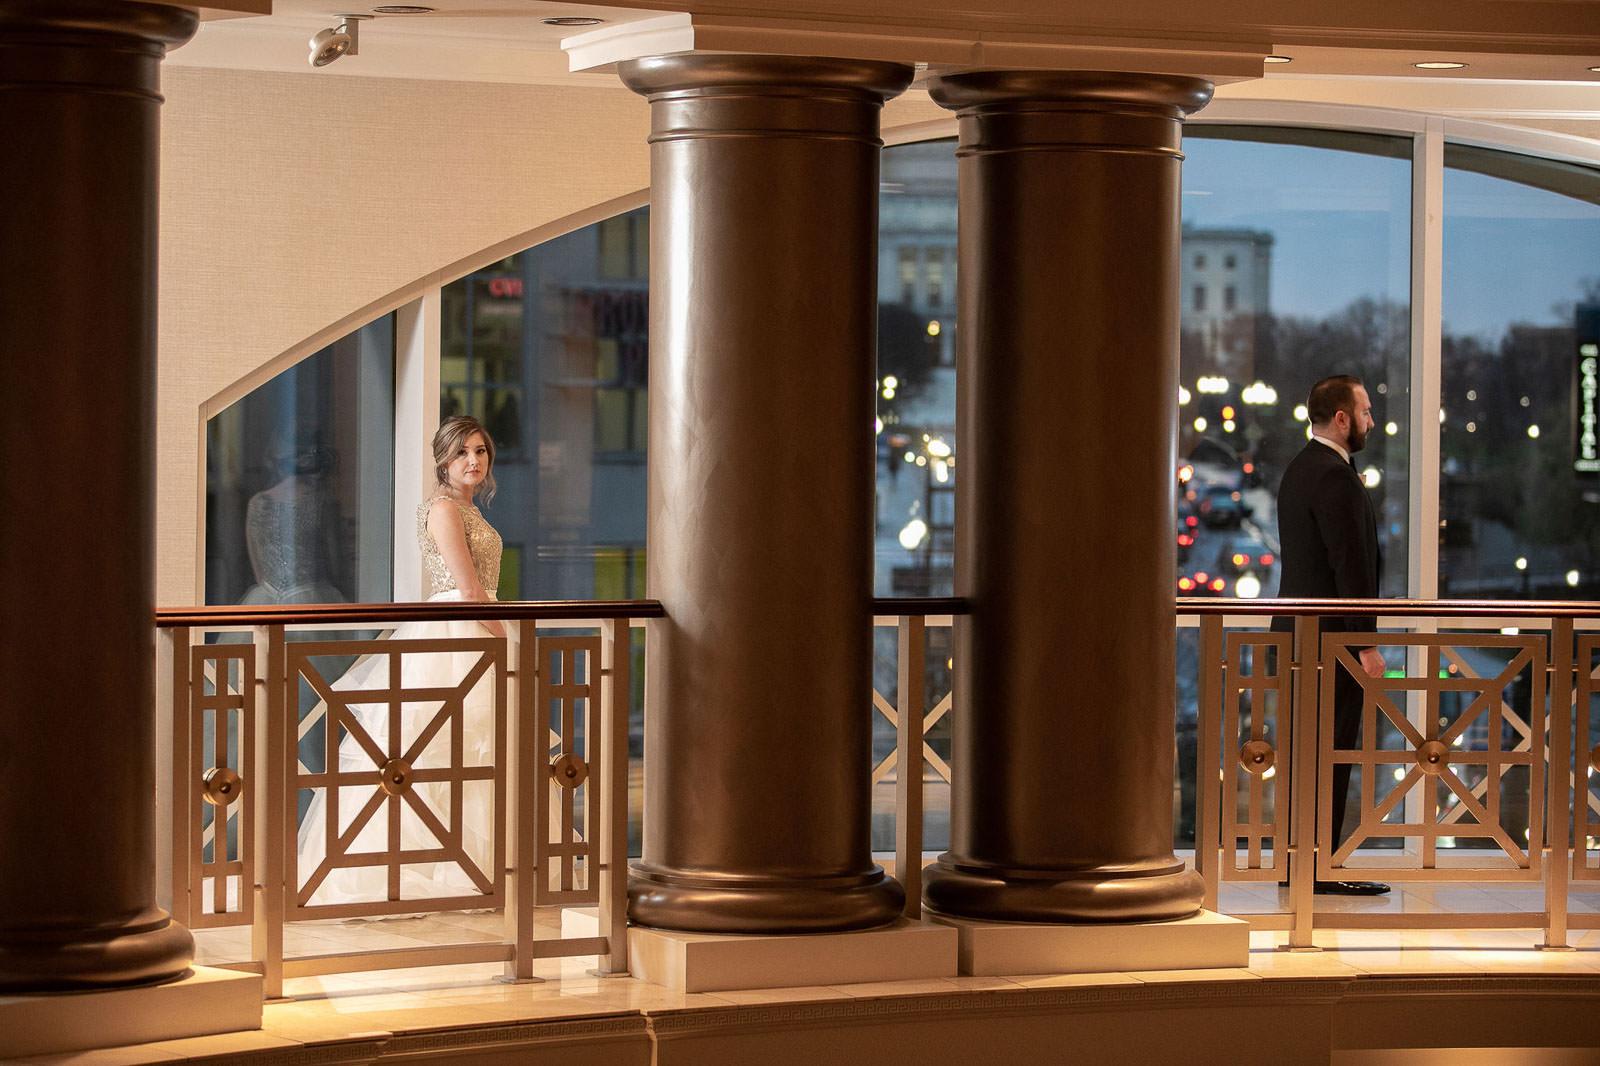 Omni Hotel Providence, Omni, Providence, Rhode Island, RI, Wedding, city wedding, November wedding, Tracy Jenkins Photography, RI wedding photographer, Rhode Island Wedding photographer, first look